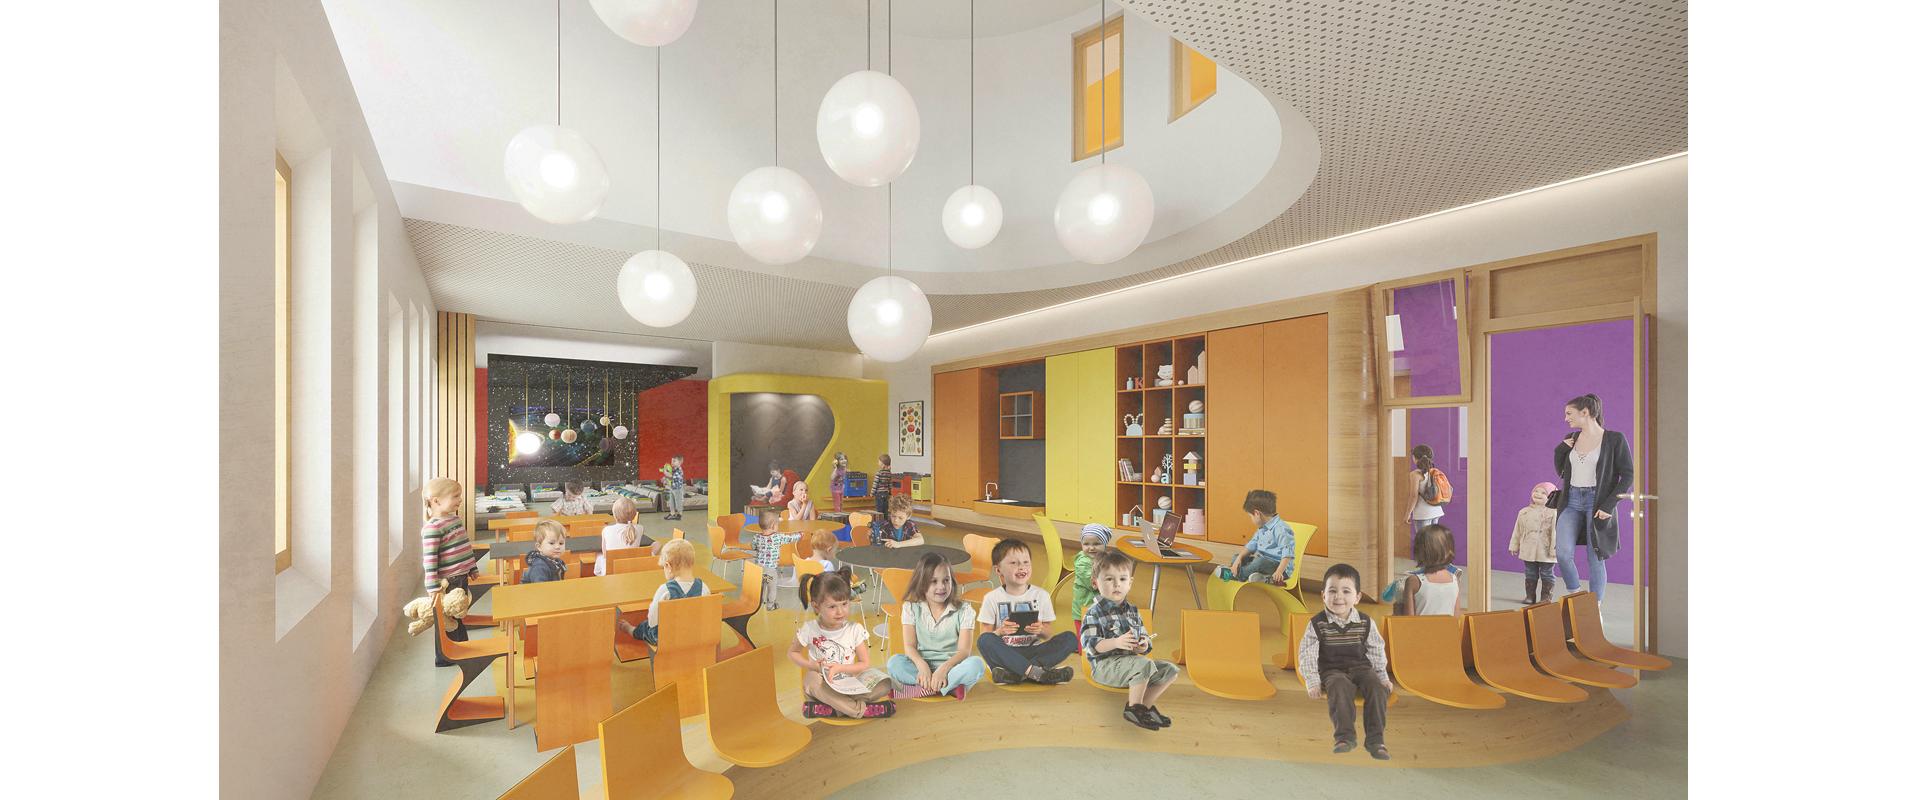 Perspective salle de classe maternelle groupe scolaire Joly Jean Avignon